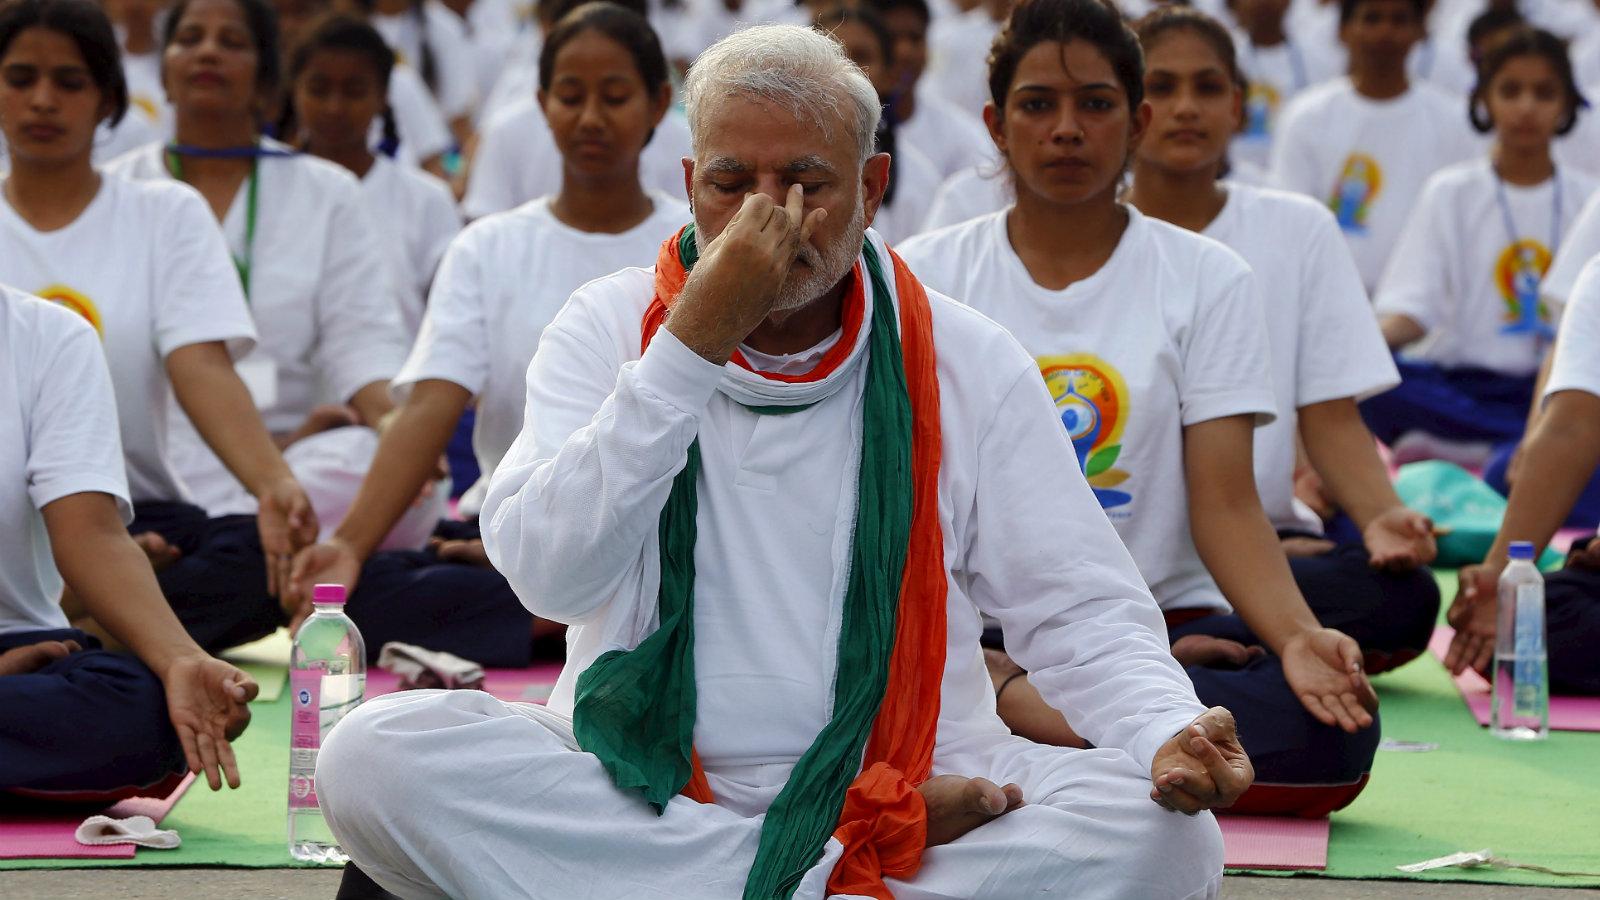 India-modi-Hinduism-yoga